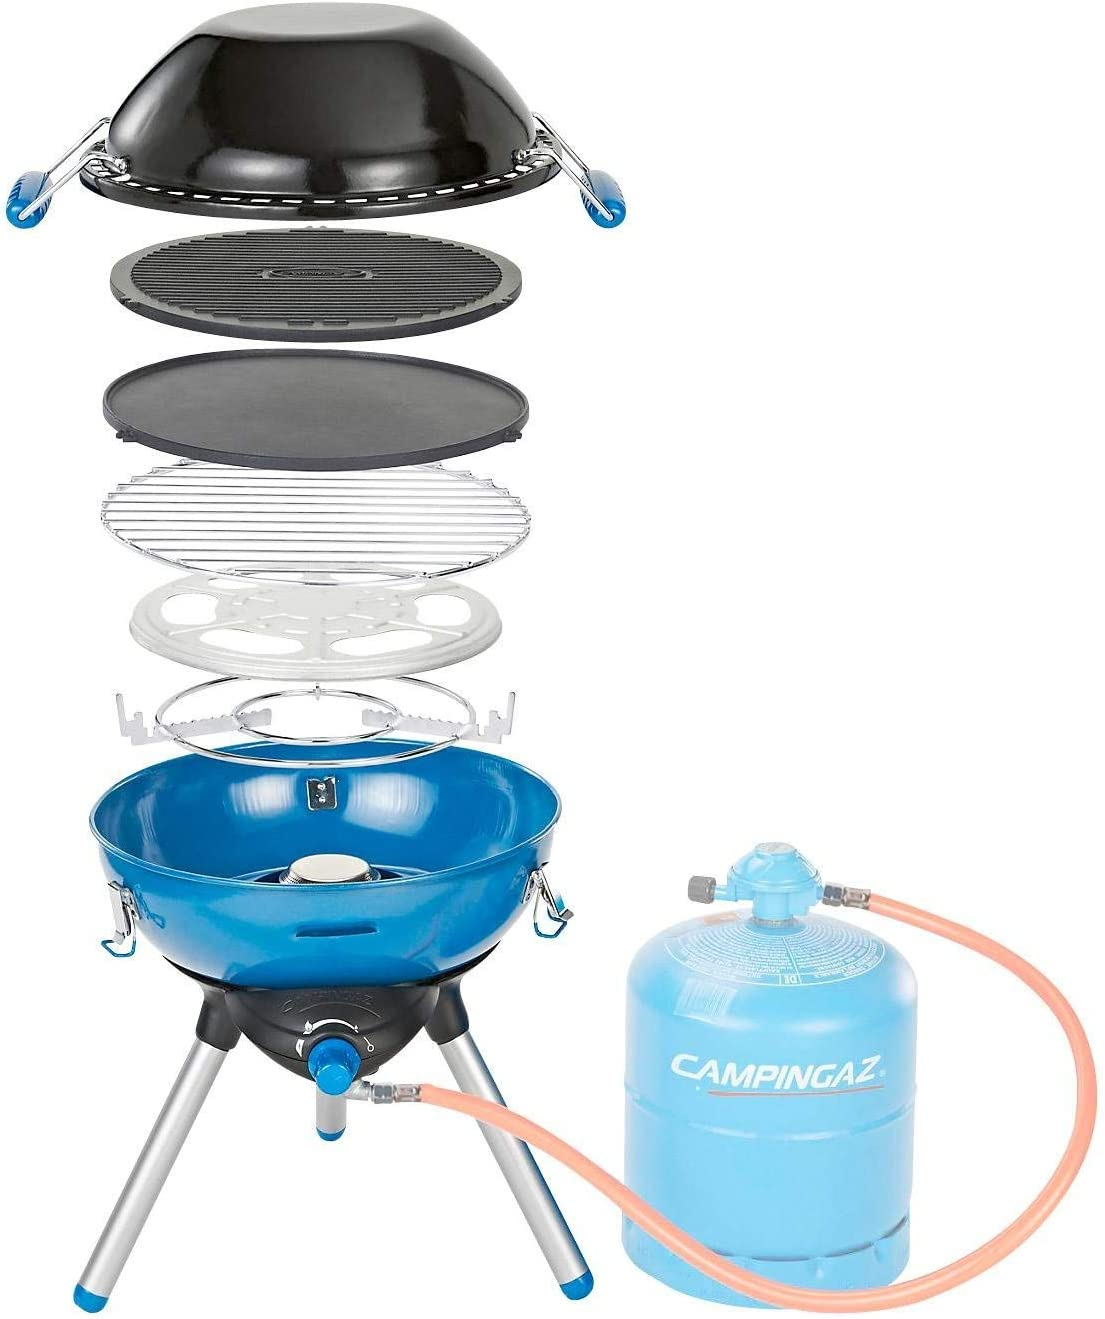 Campingaz parrilla de gas, Azul, 45 x 15 x 15 cm, 694001 ...